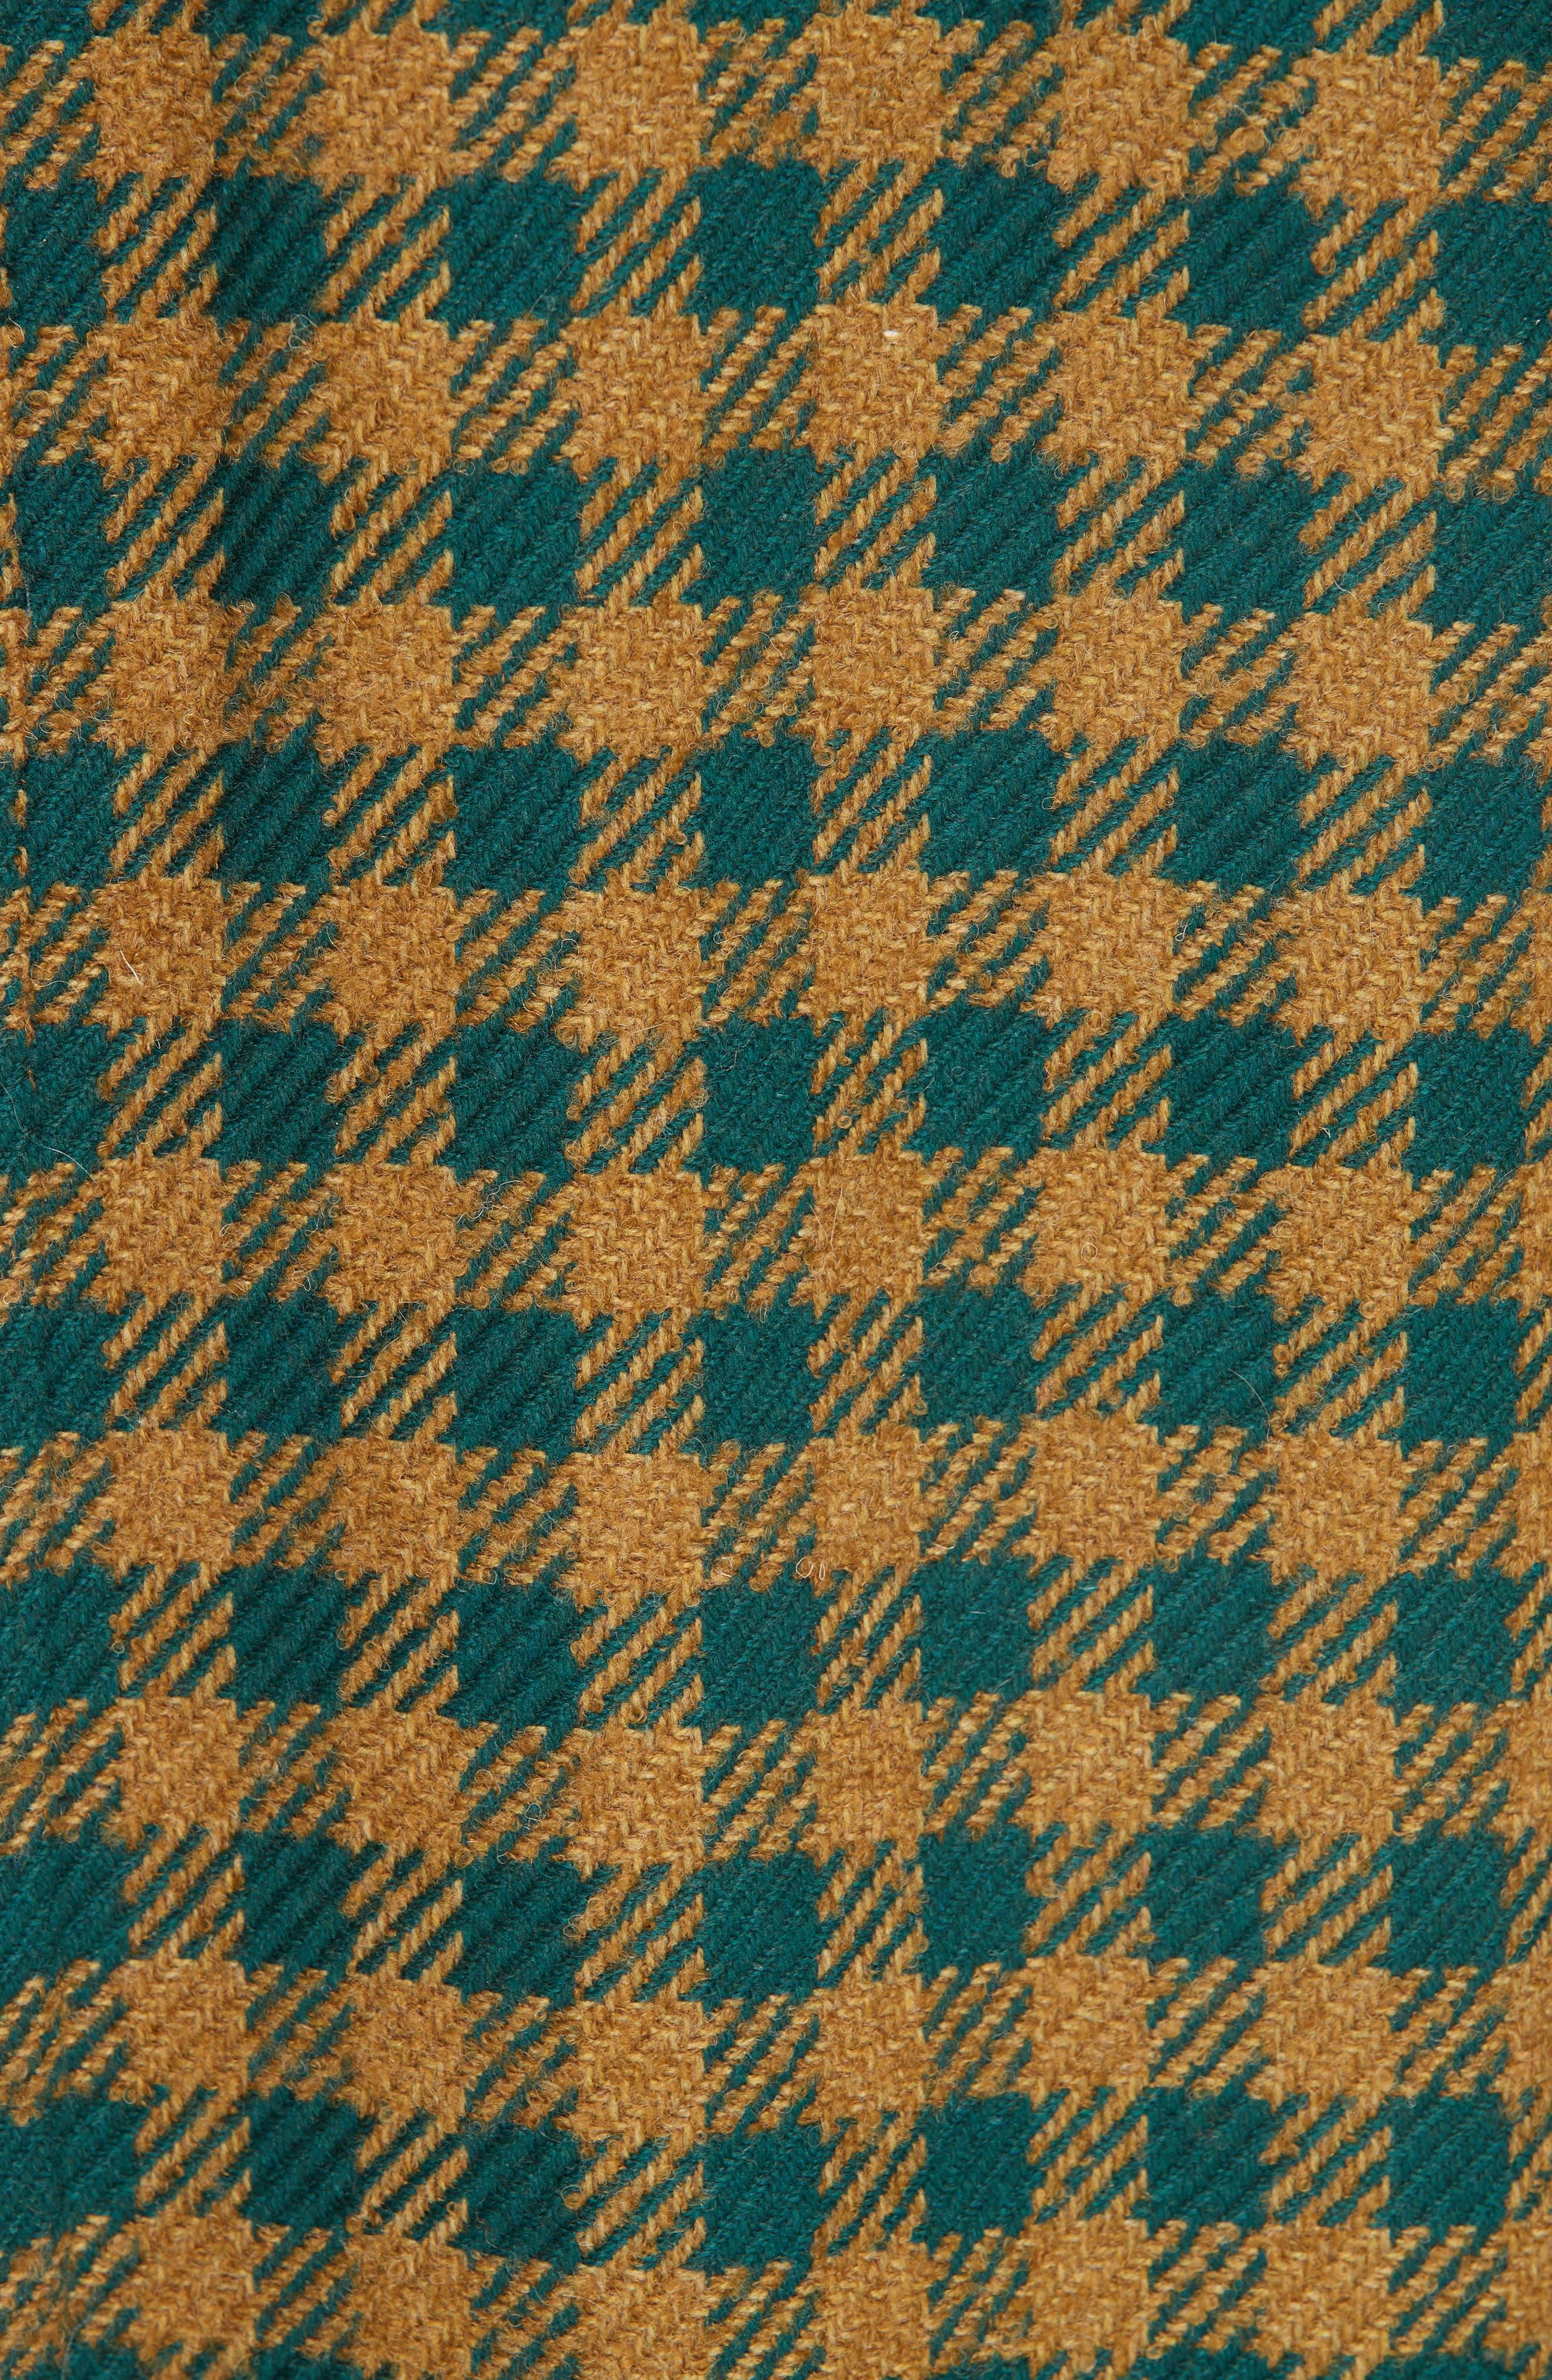 Ethno Pop Check Boyfriend Coat,                             Alternate thumbnail 6, color,                             GREEN CHECK